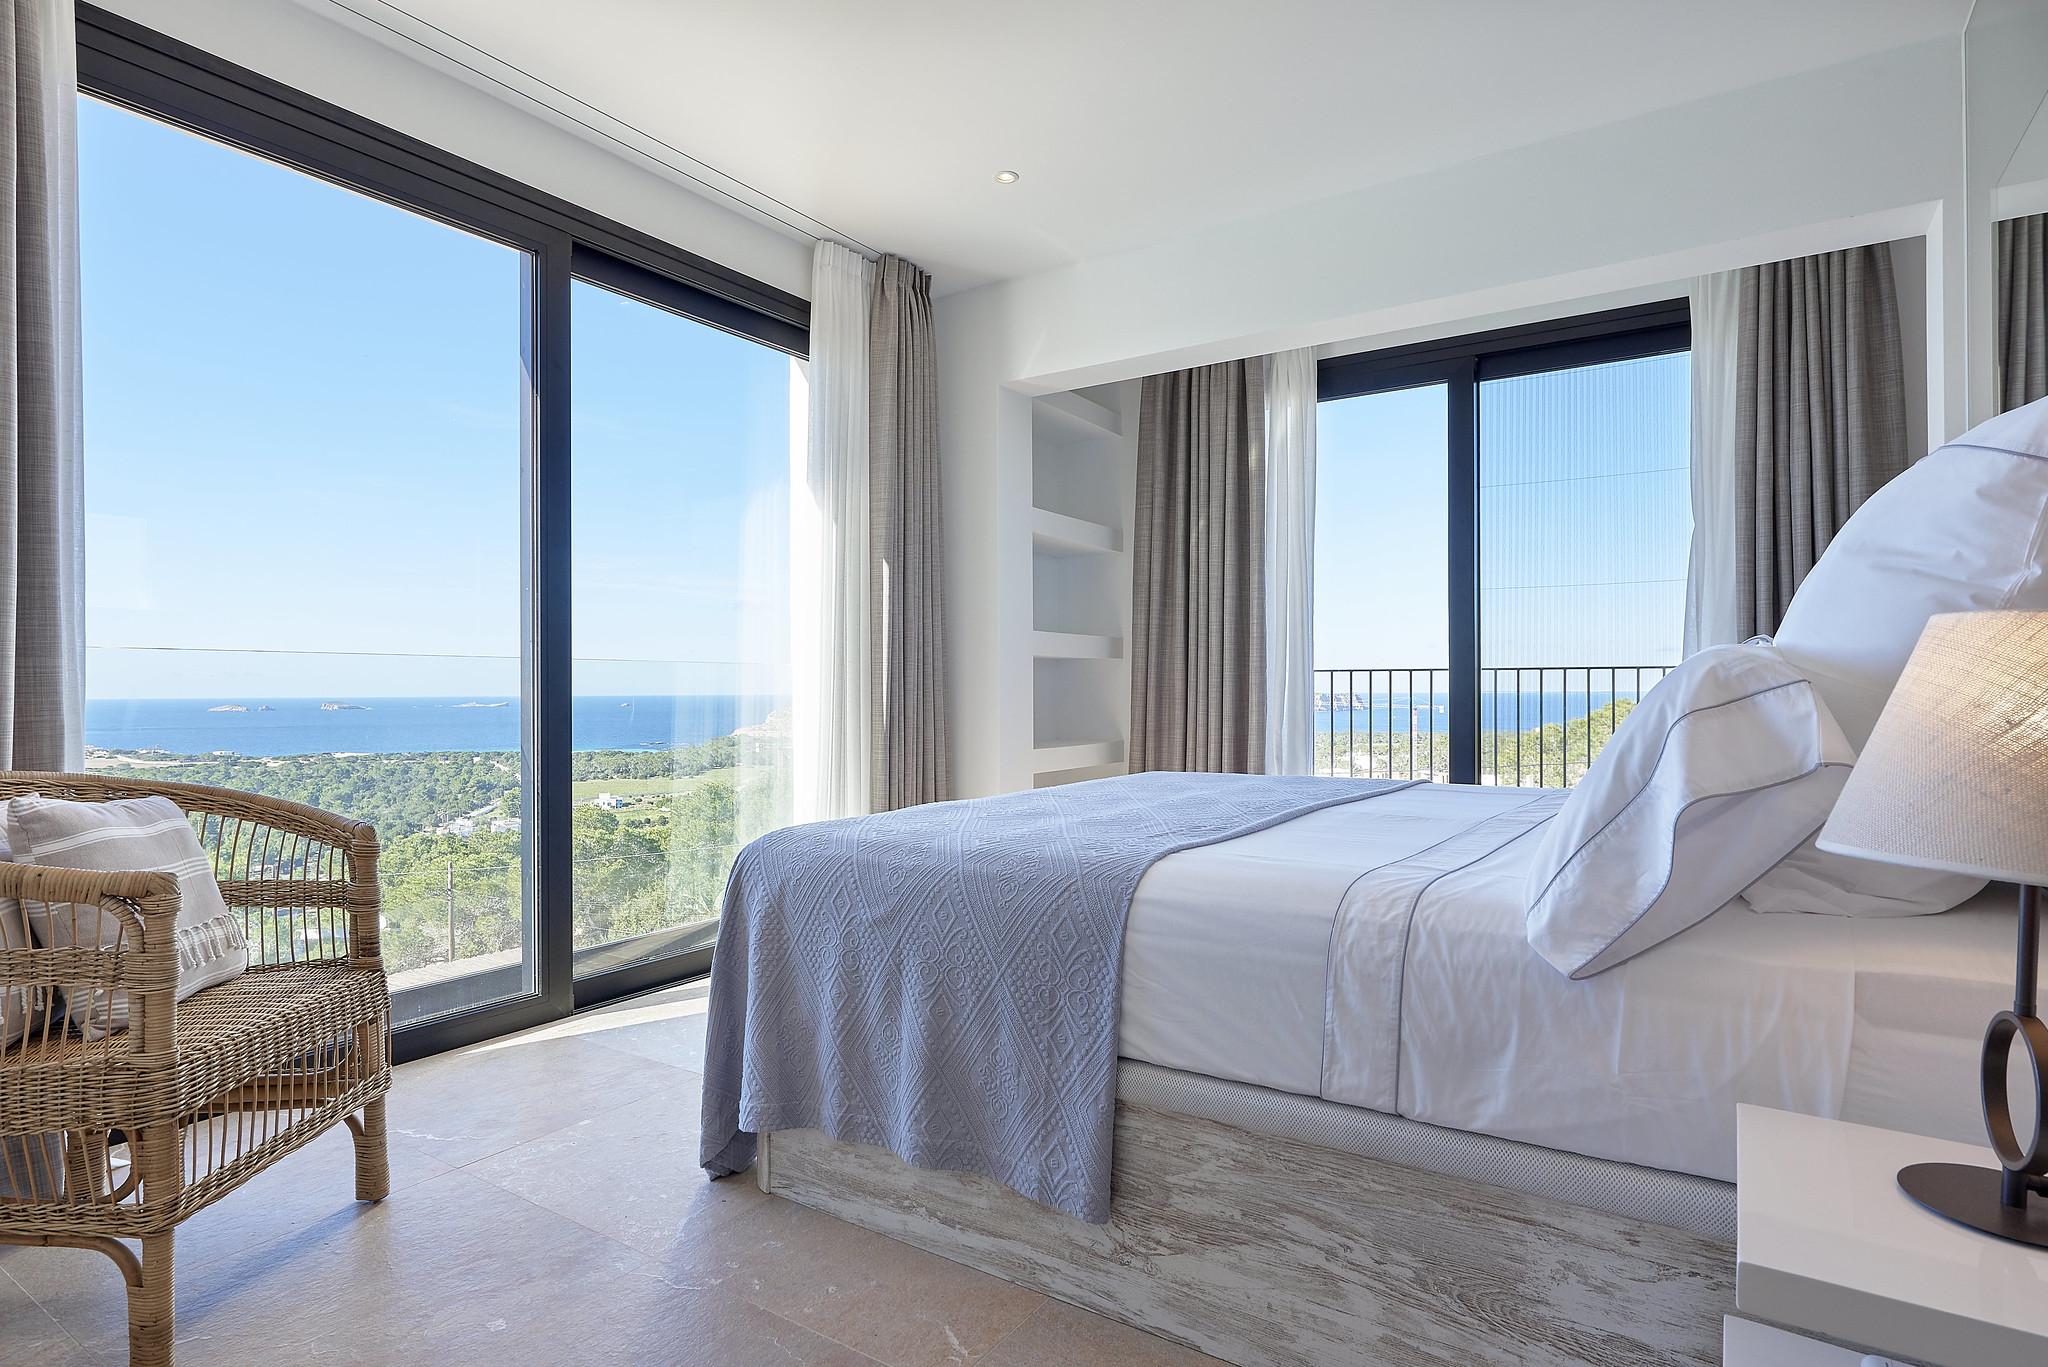 https://www.white-ibiza.com/wp-content/uploads/2020/06/white-ibiza-villas-sa-serra-interior-bedroom8.jpg